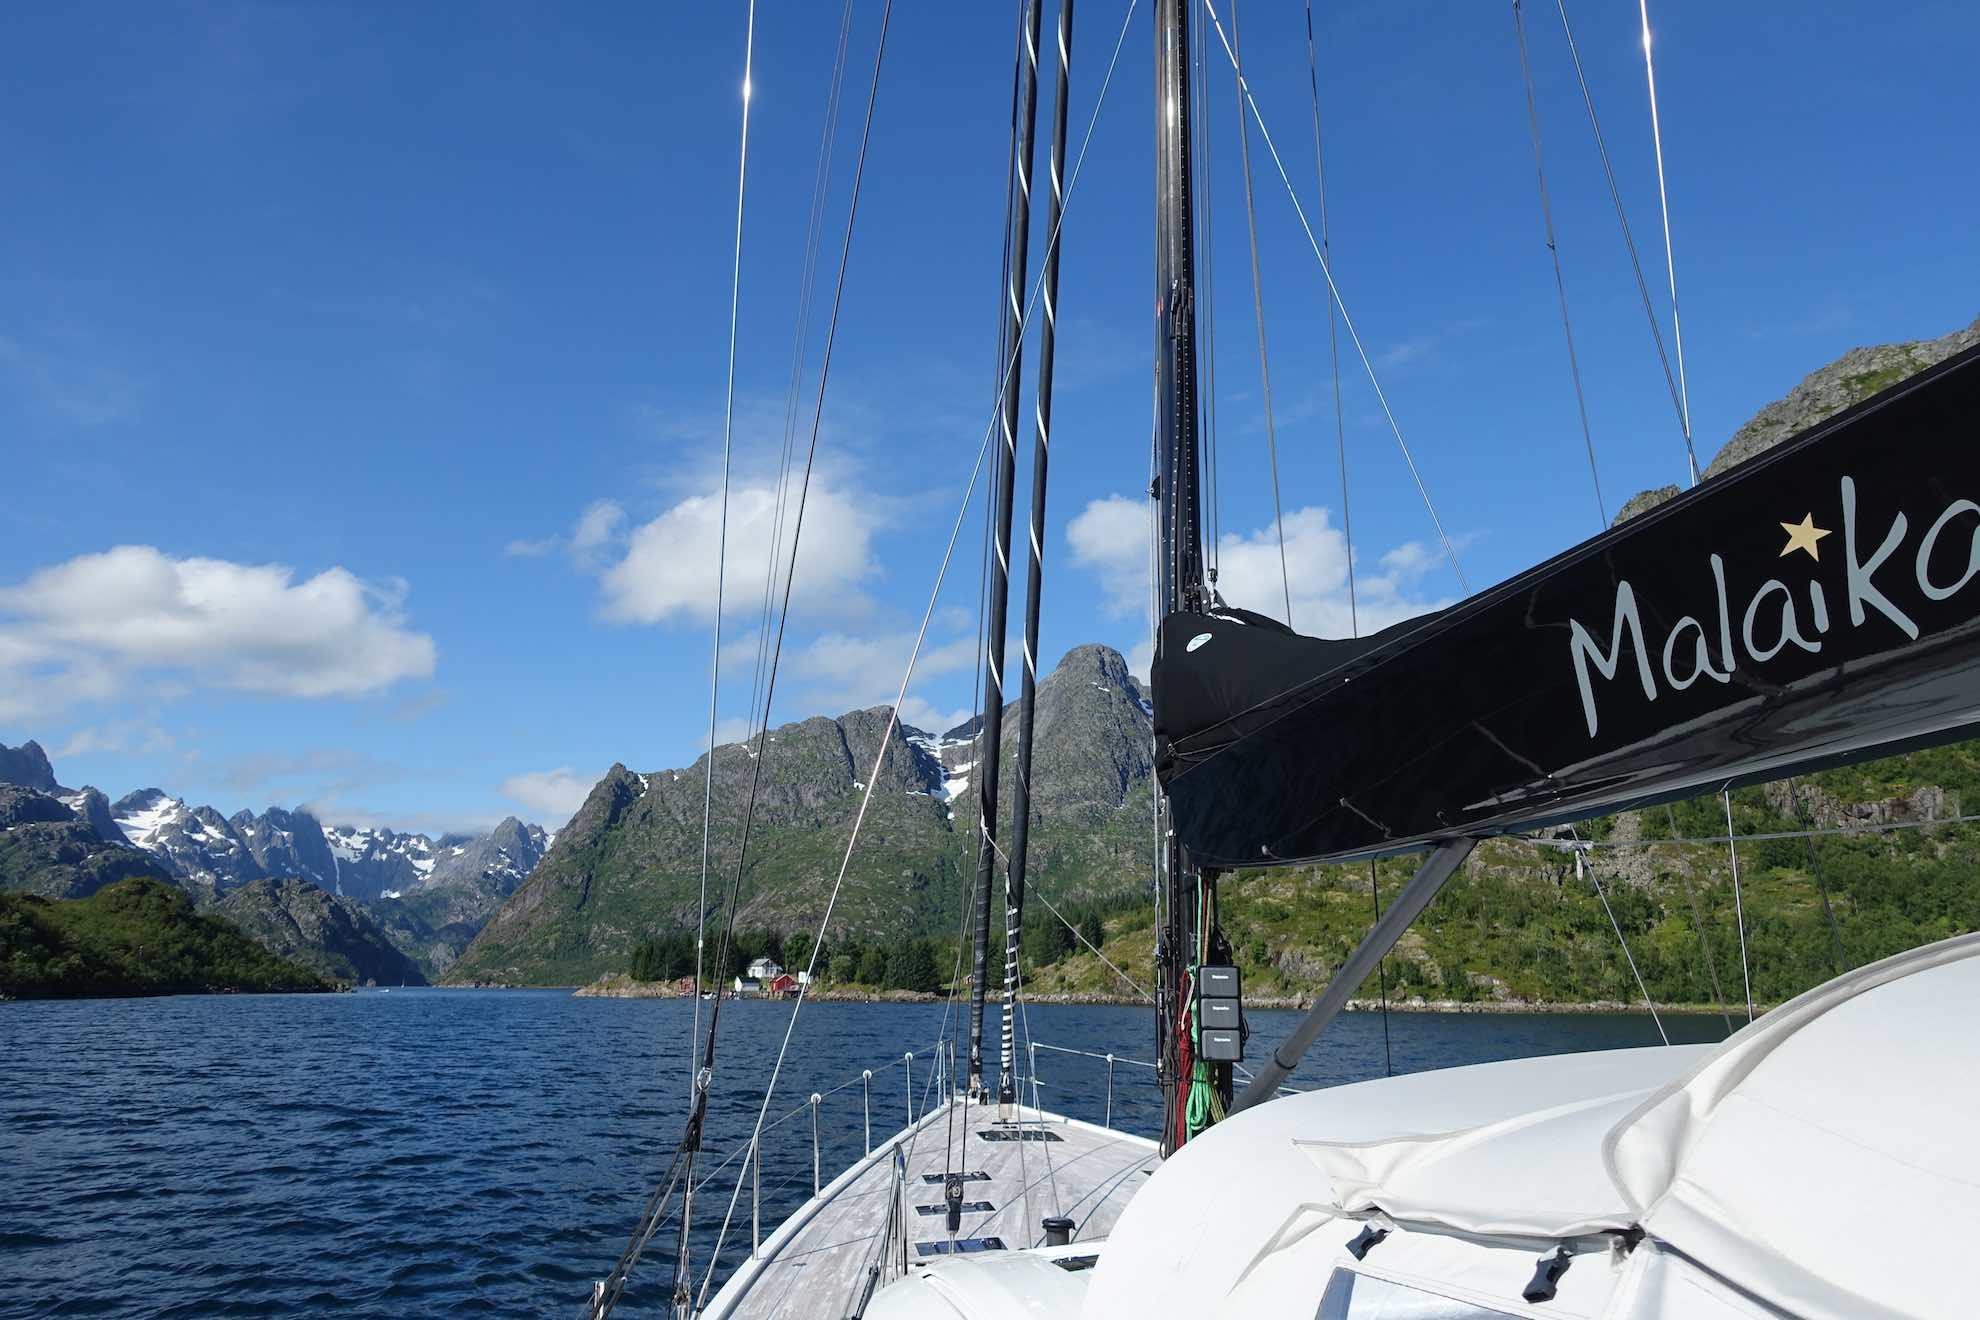 Malaika in den Fjorden der Lofoten.